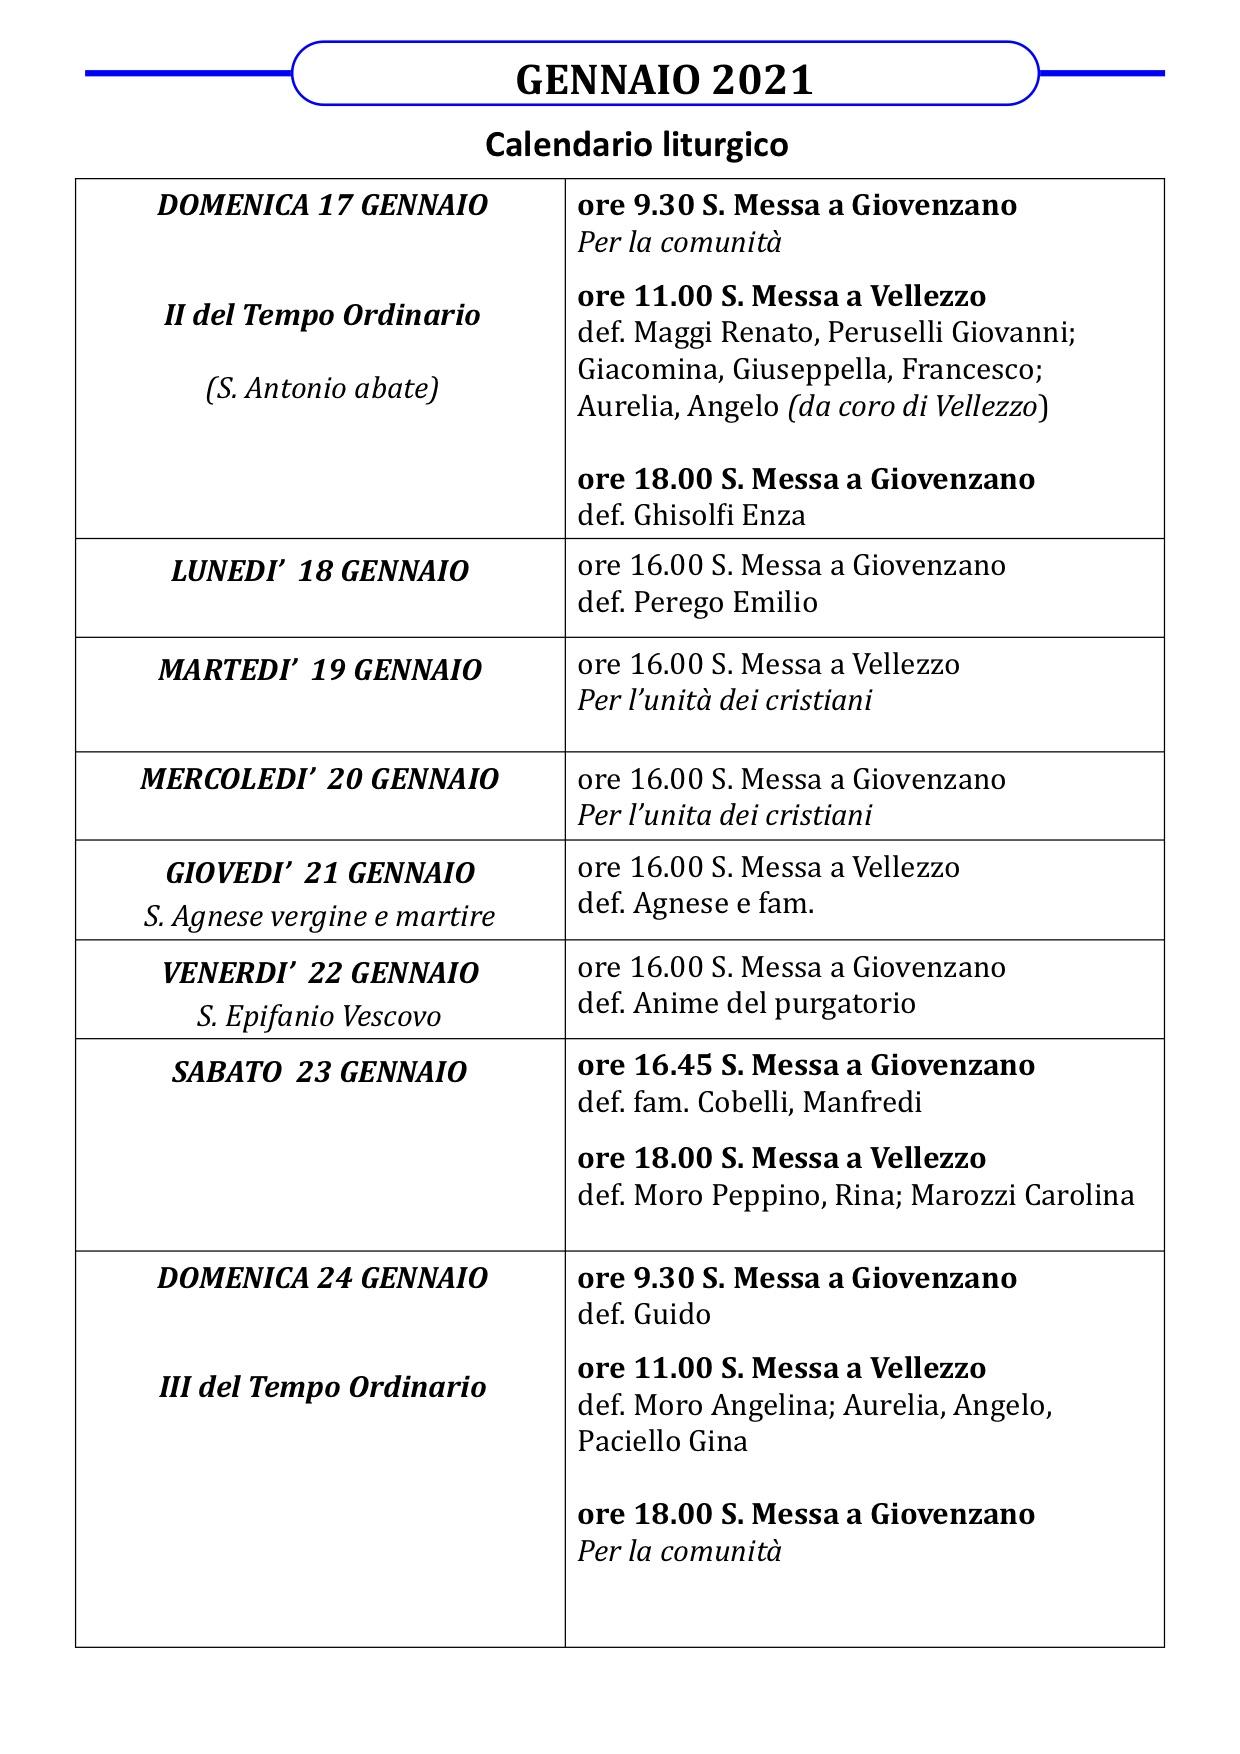 Calendario Liturgico dal 17 al 24 gennaio 2021